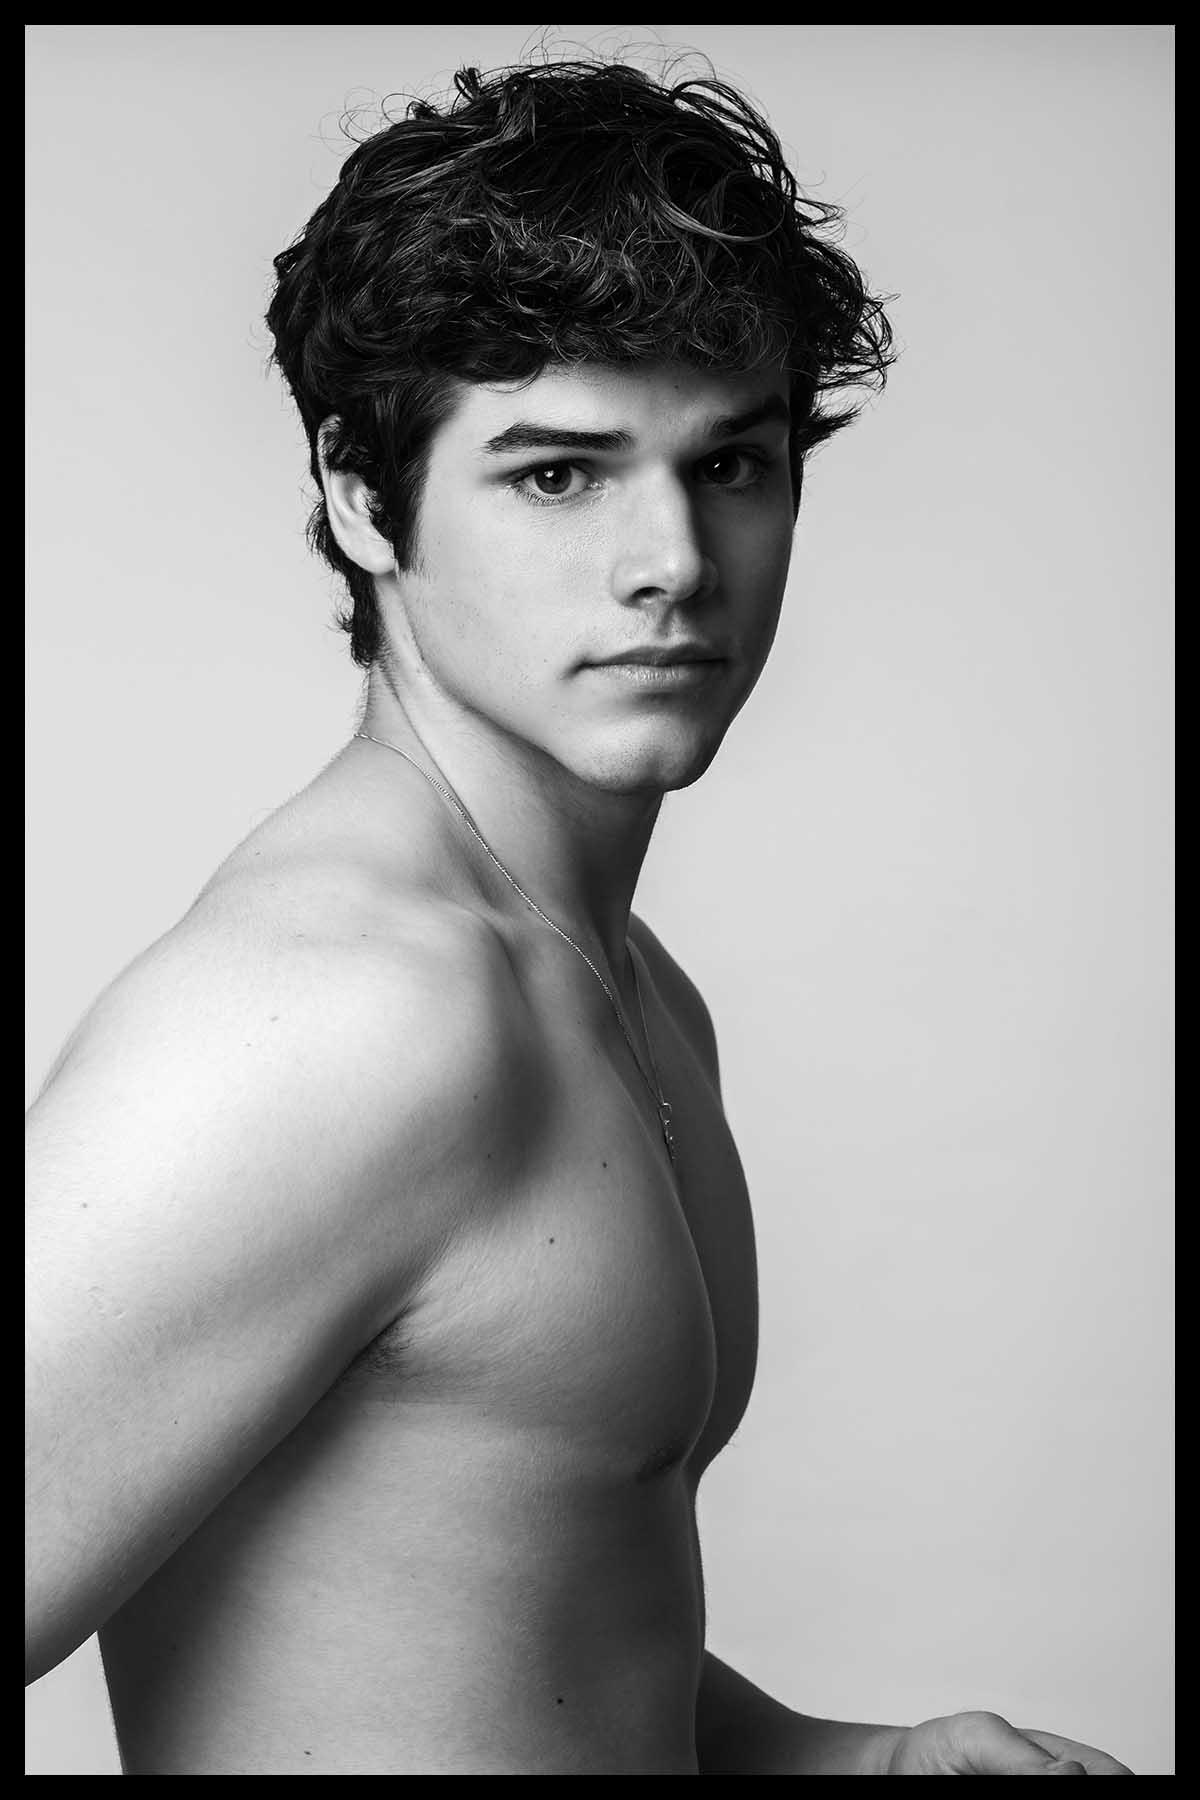 Igor Marot by Ronaldo Gutierrez for Brazilian Male Model